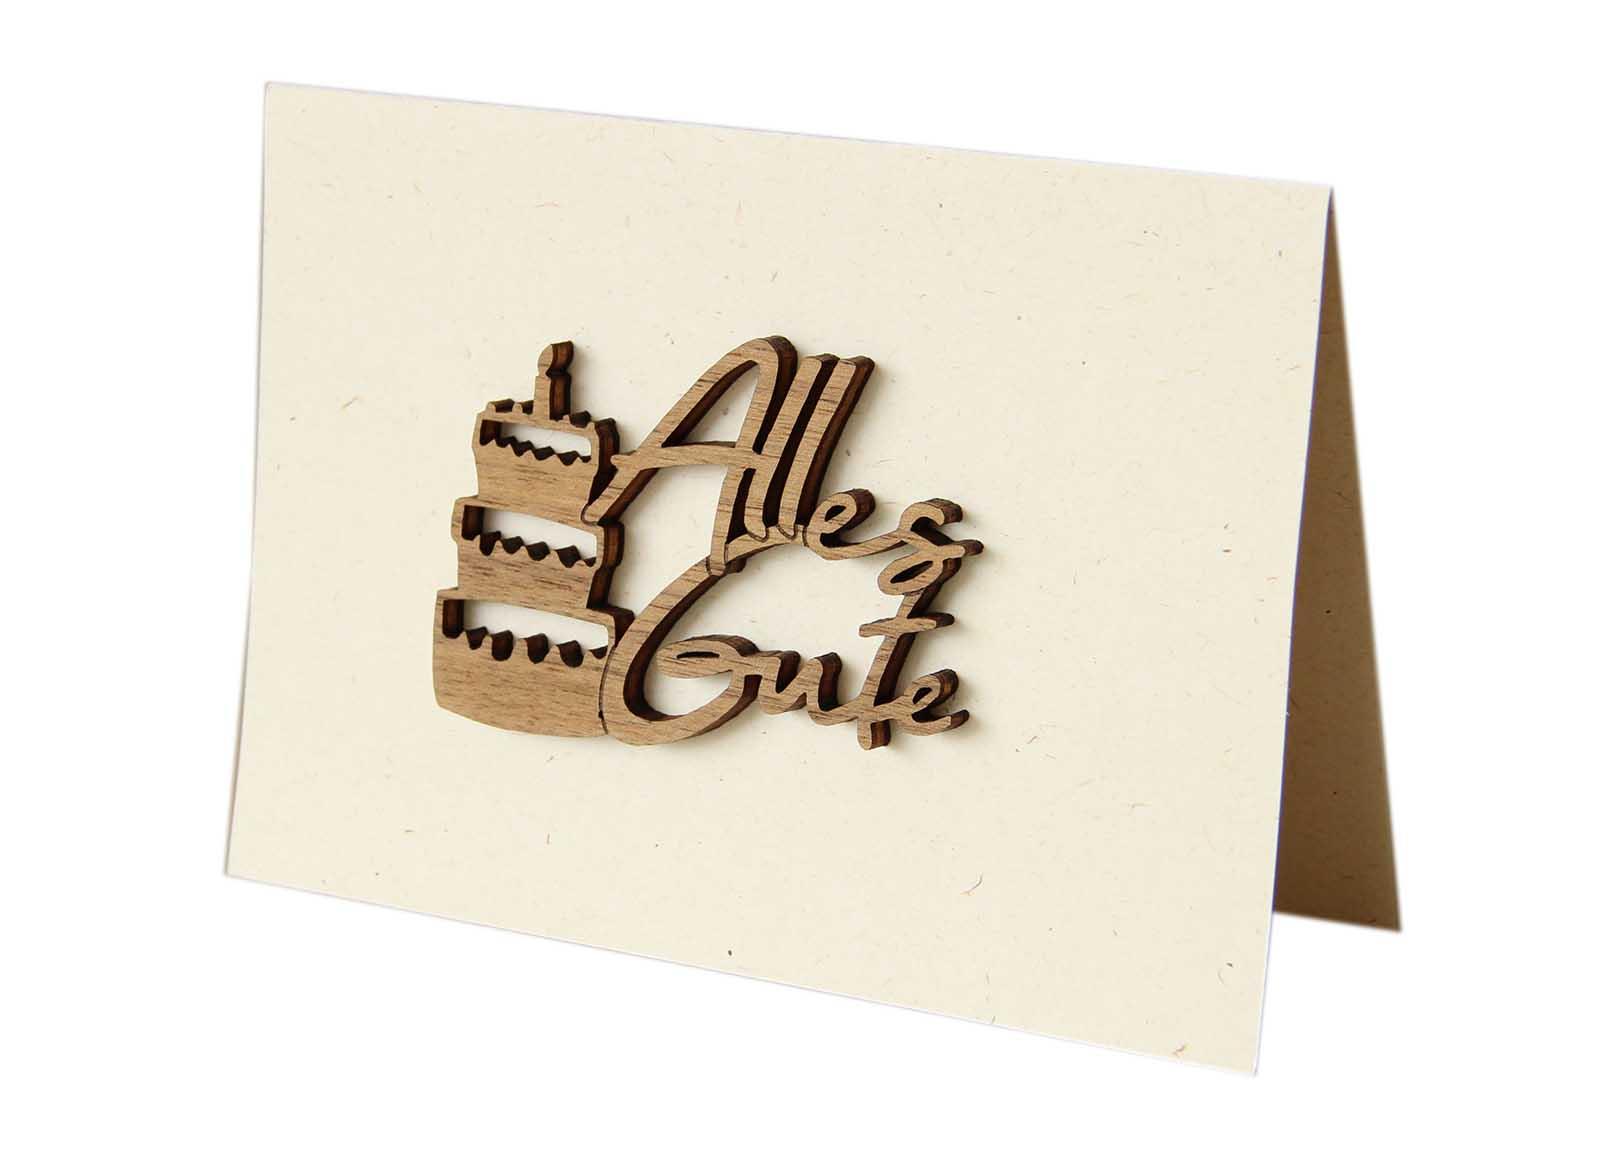 "Original Holzgrußkarte - Papierkarte mit Schriftzug aus Echtholz in Nuss ""Alles Gute"", inkl. Motiv Torte, Postkarte, Geschenkkarte, Klappkarte, Karte, Geburtstagskarte"